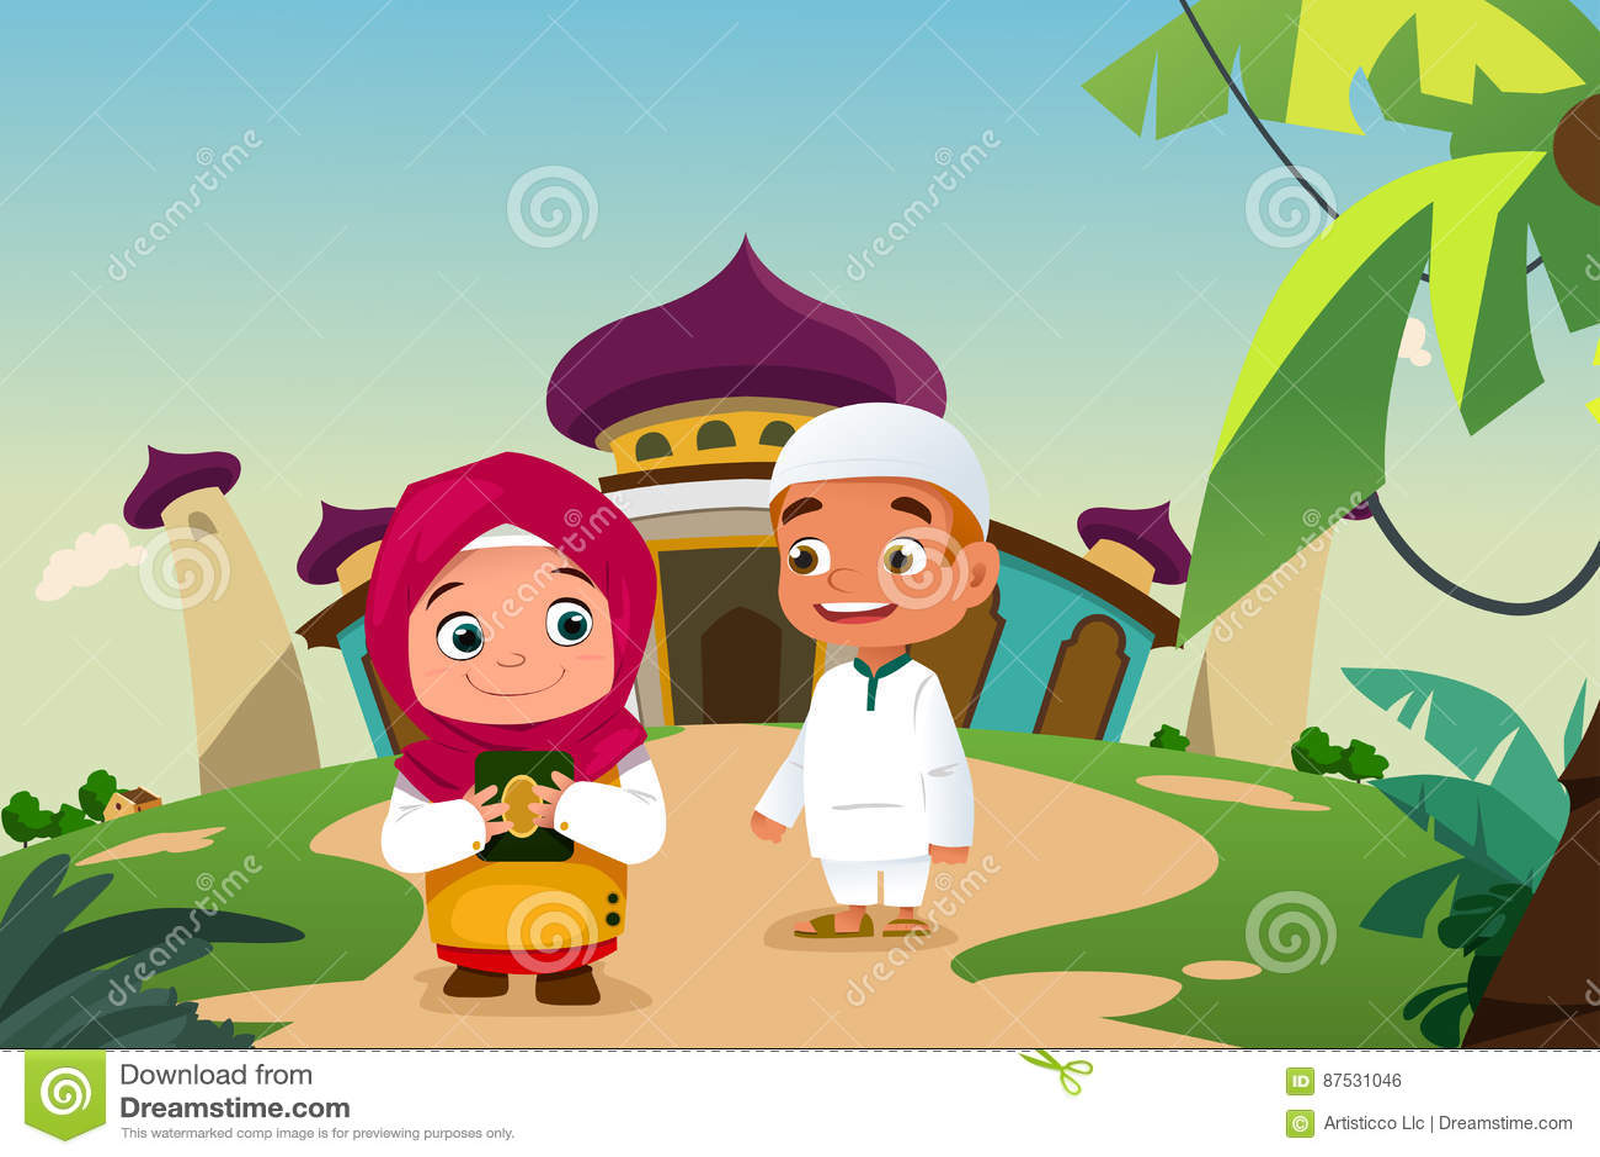 Muslim Kids Leaving a Mosque